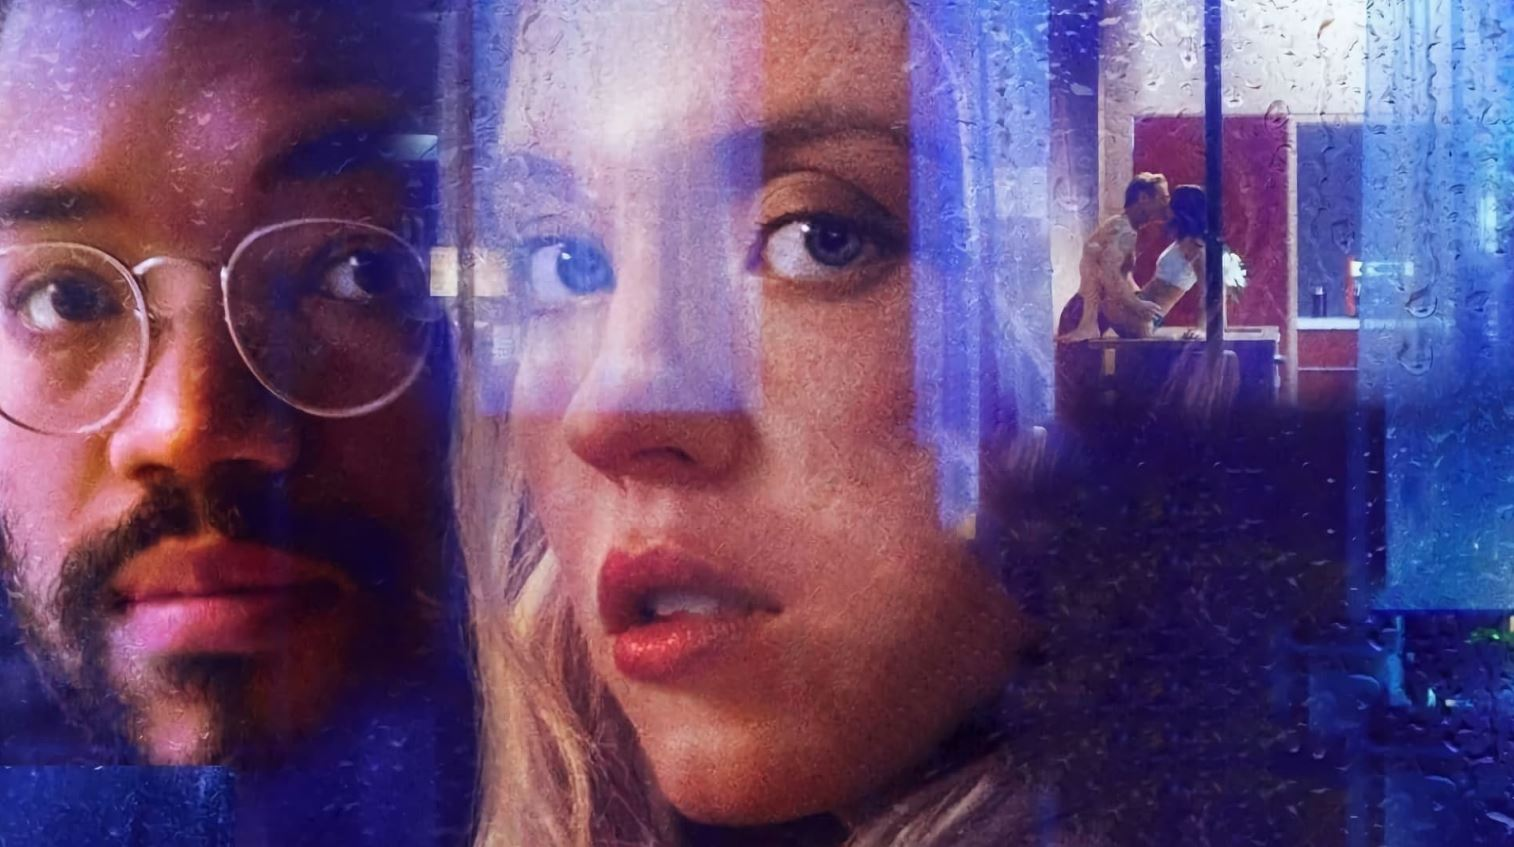 Watch The Voyeurs (2021) Full Movies Full HD Free Online